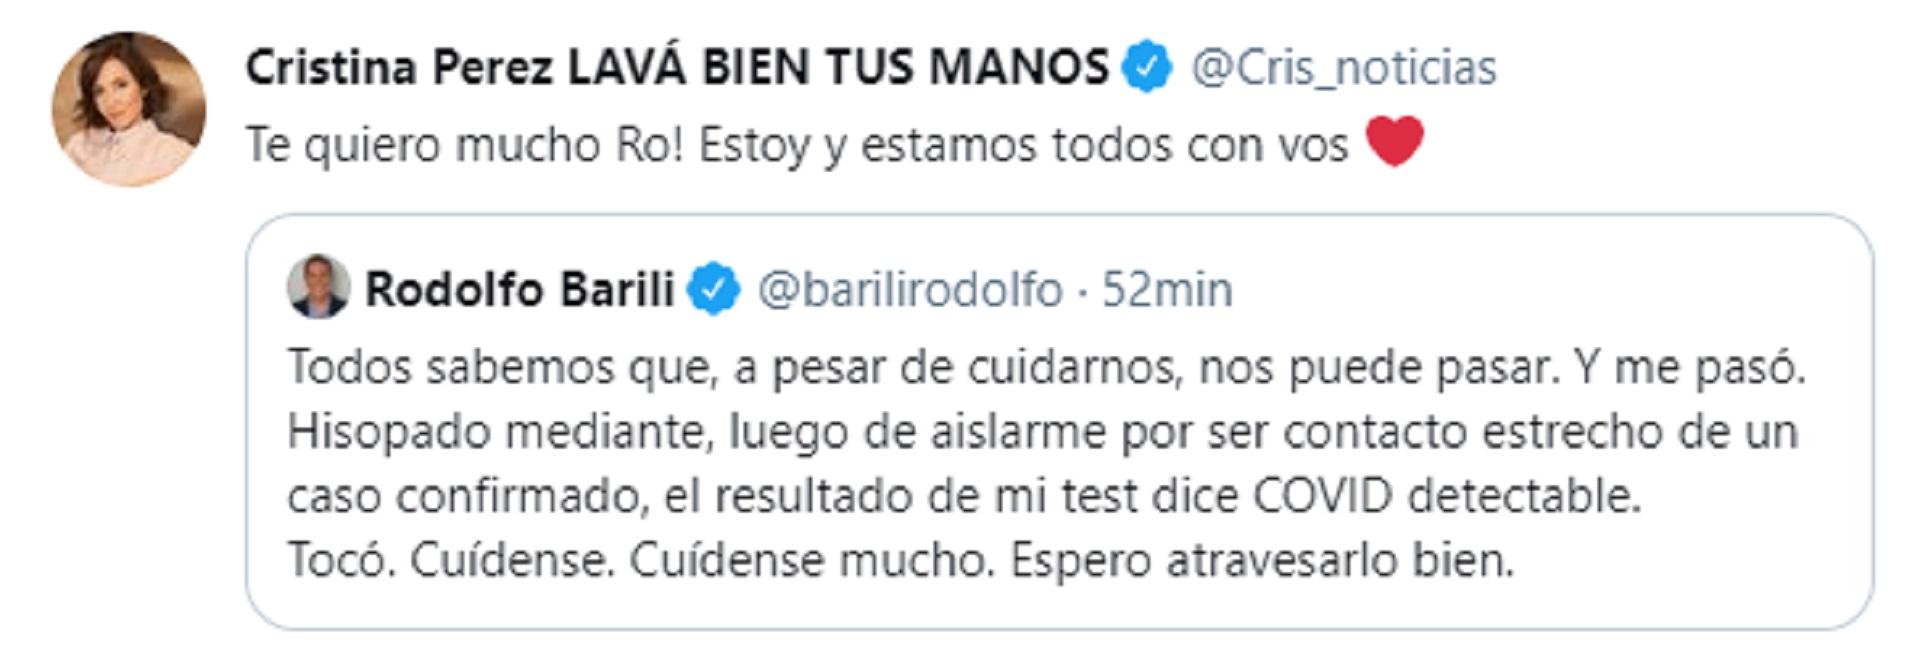 El mensaje de Cristina Pérez